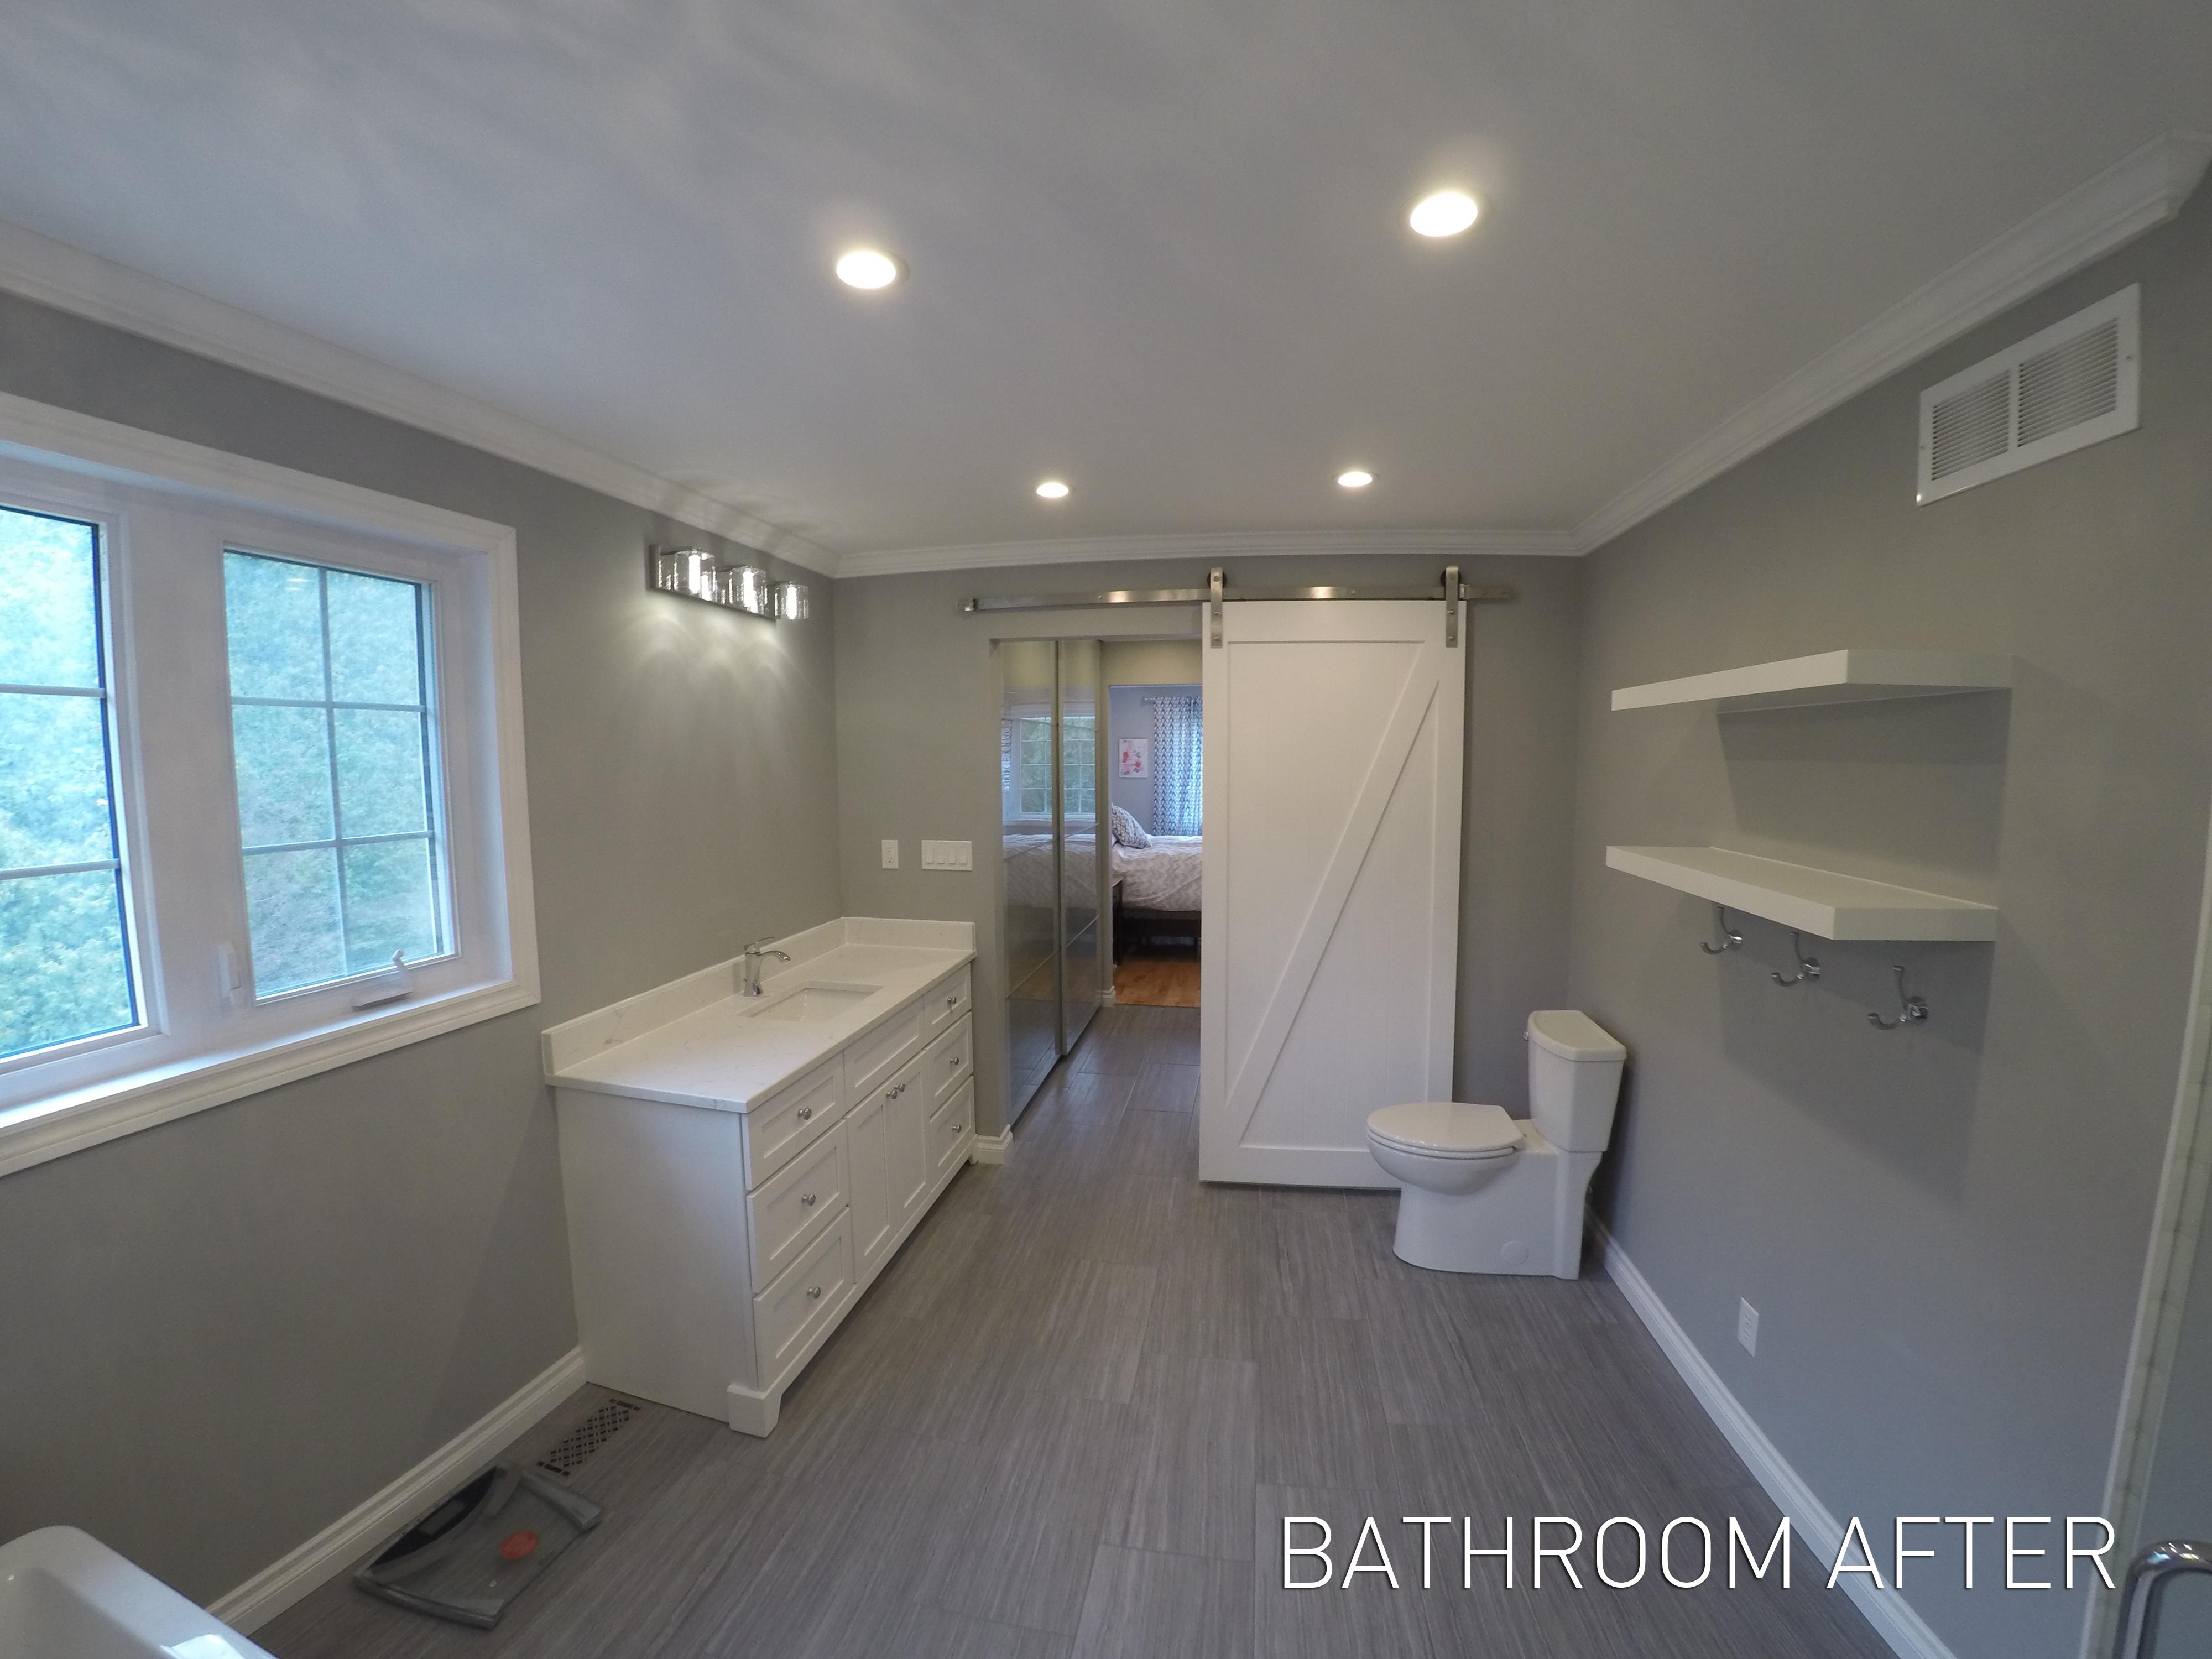 BroLaws Master Bathroom After 2